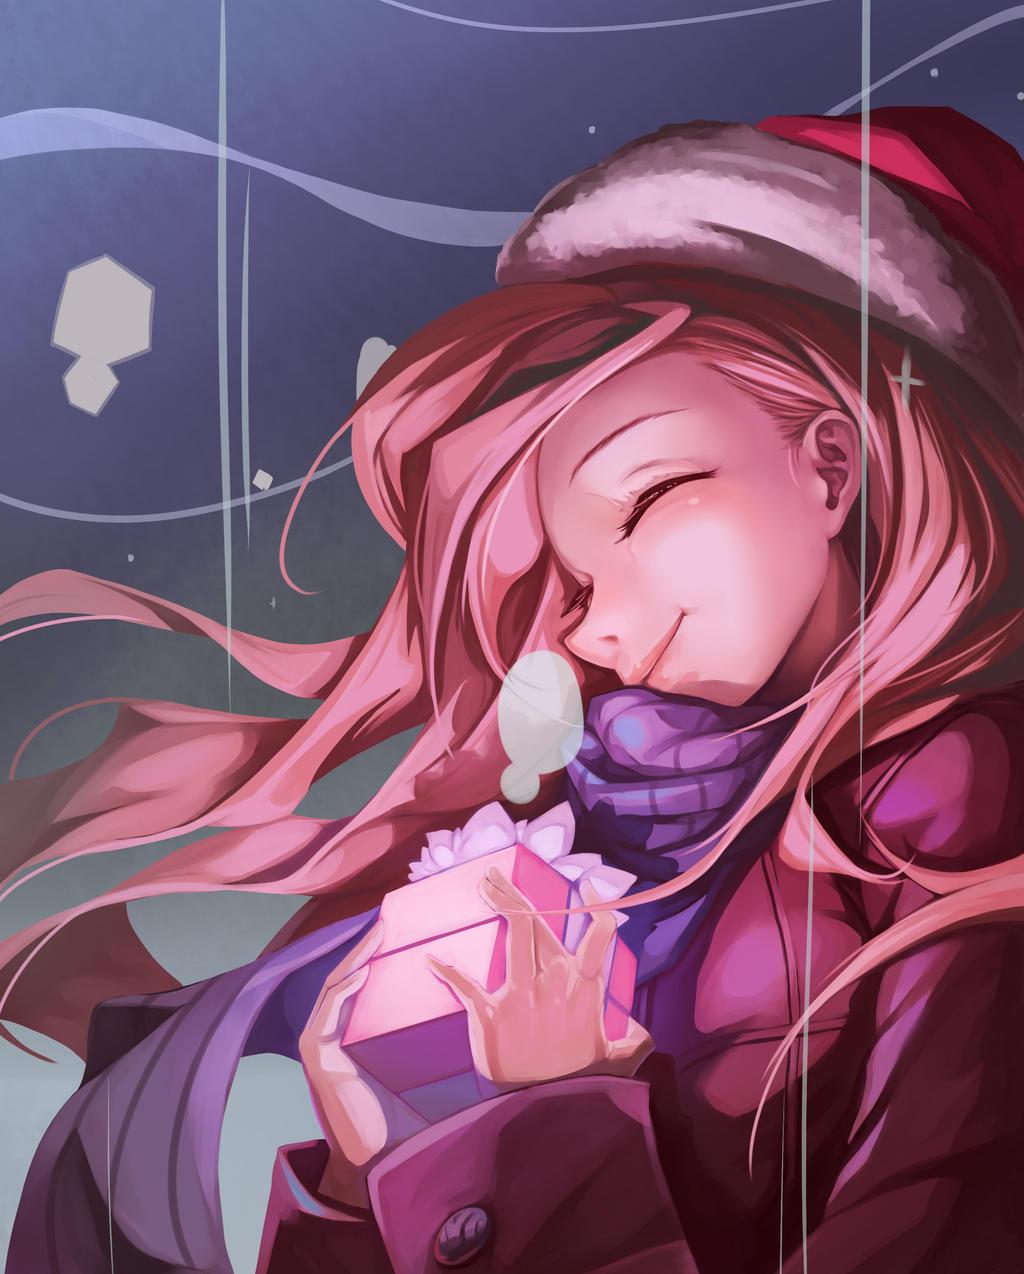 Christmas 2013 by iorlvm